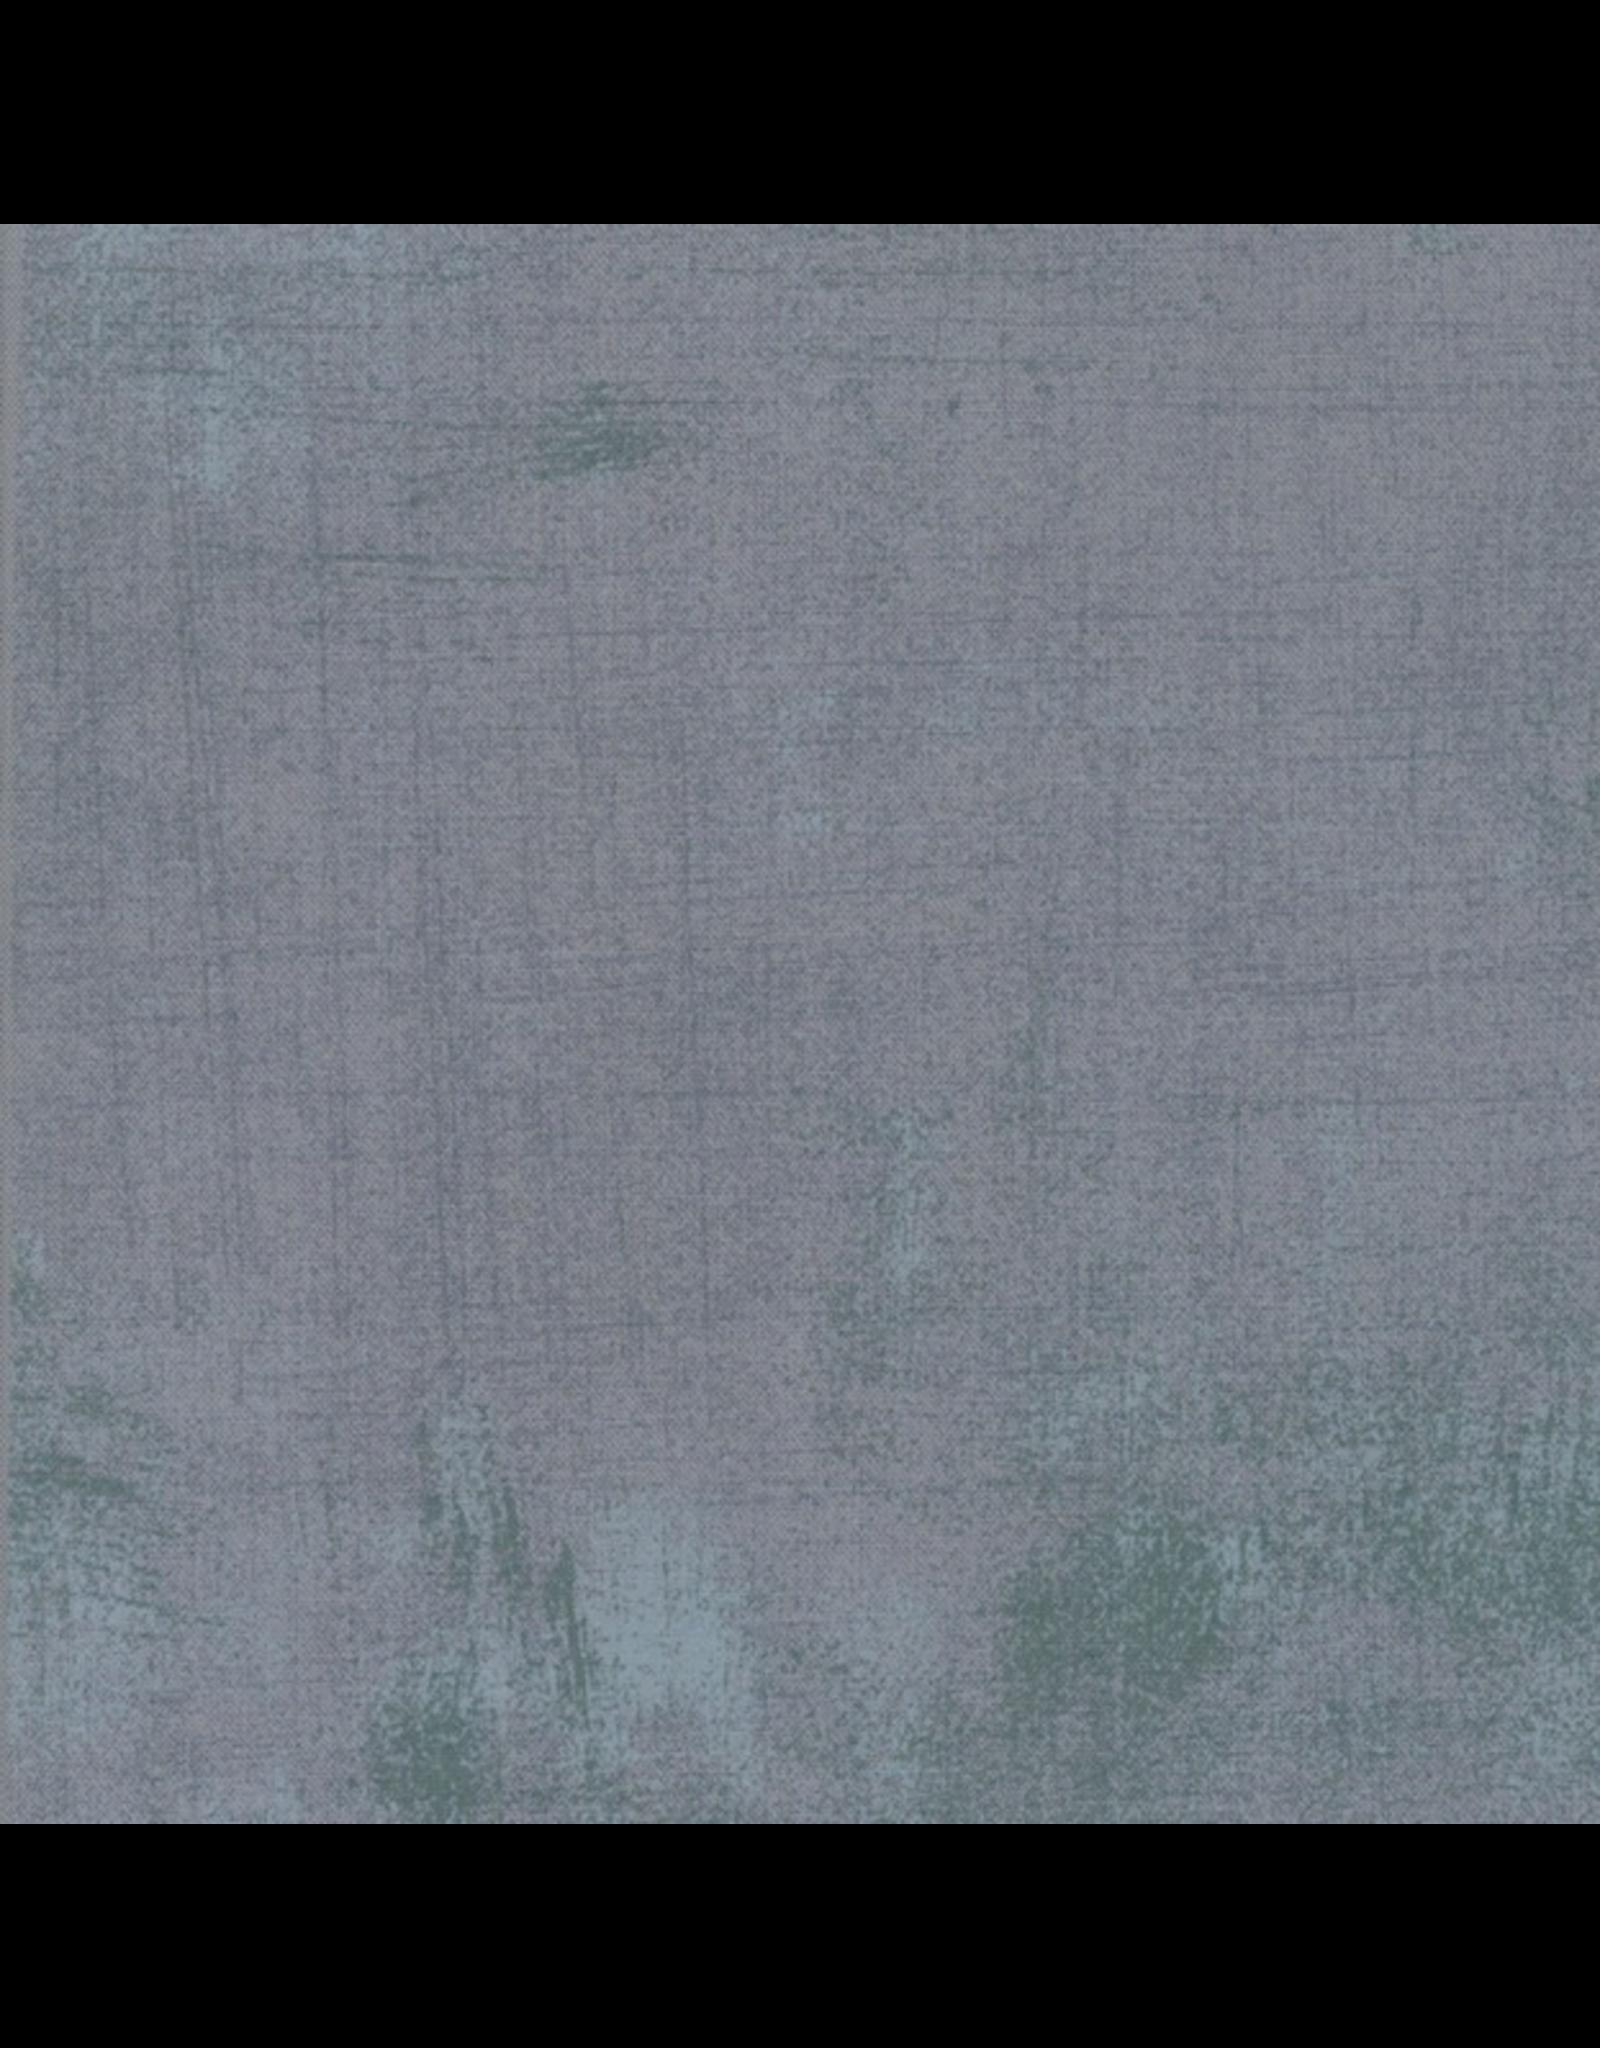 Moda Grunge in Smoke, Fabric Half-Yards